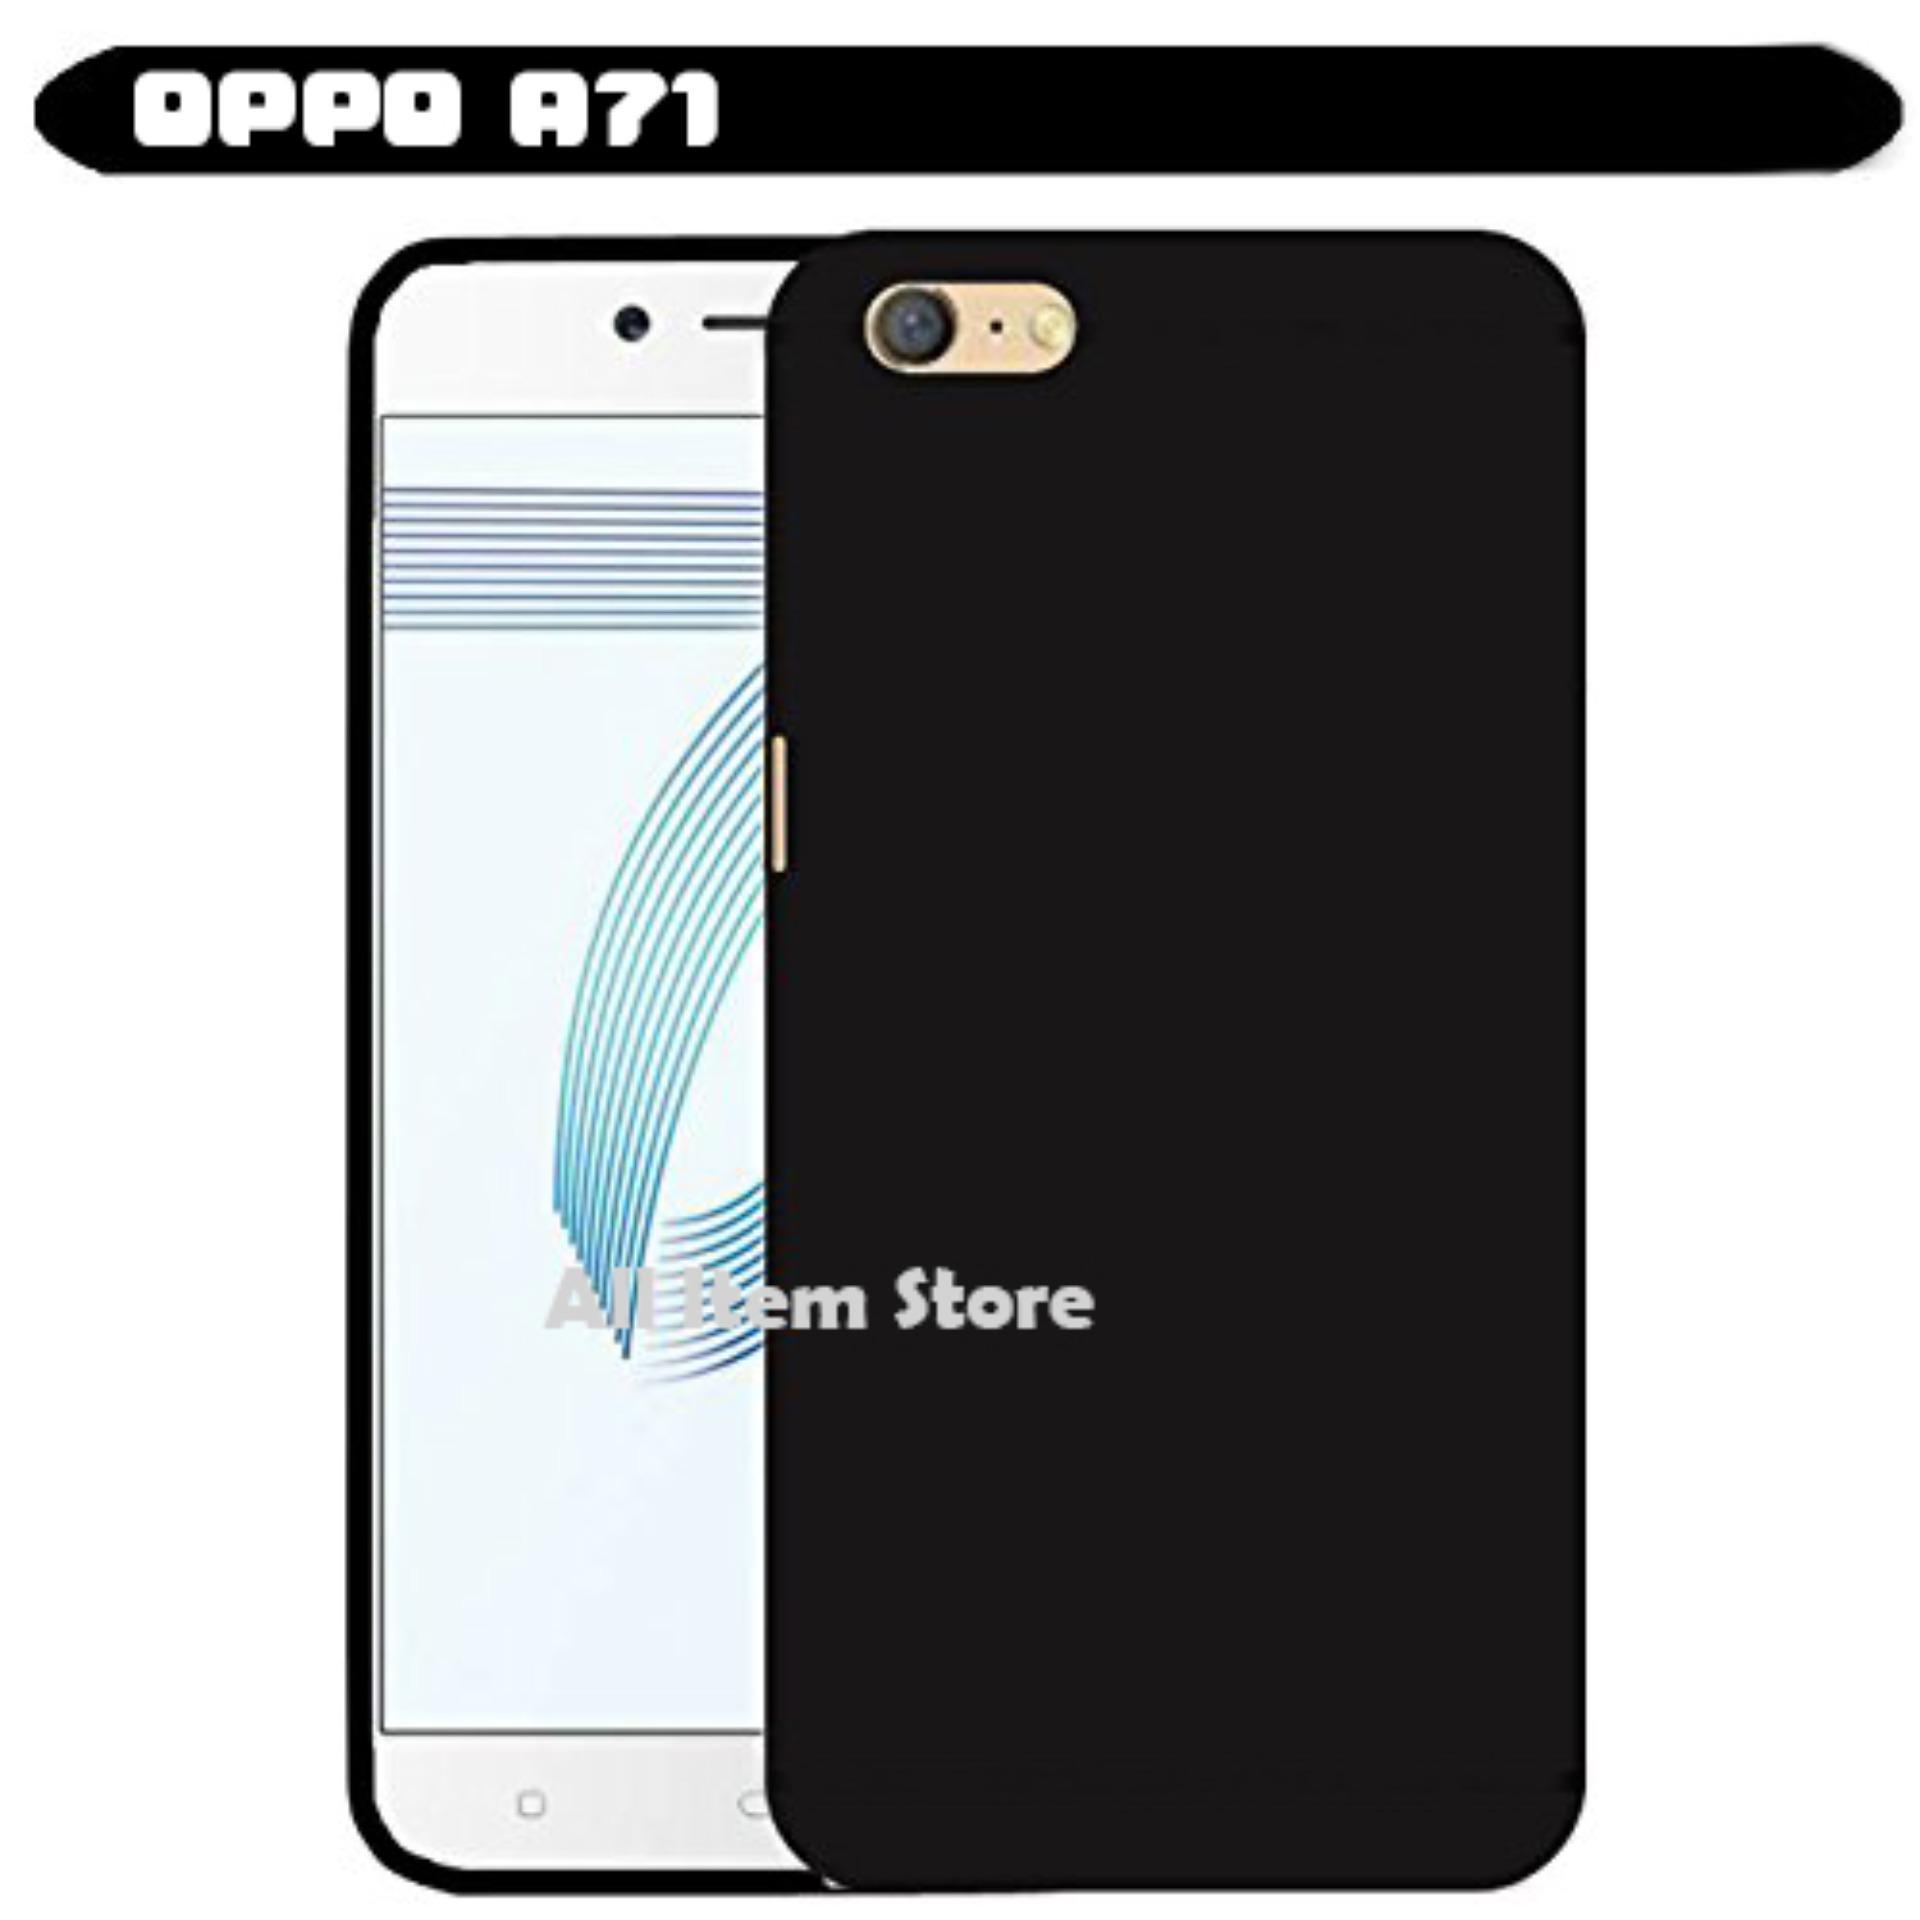 Rp 5.800. Case Slim Black Matte Oppo A71 Baby Skin Softcase Ultra ...